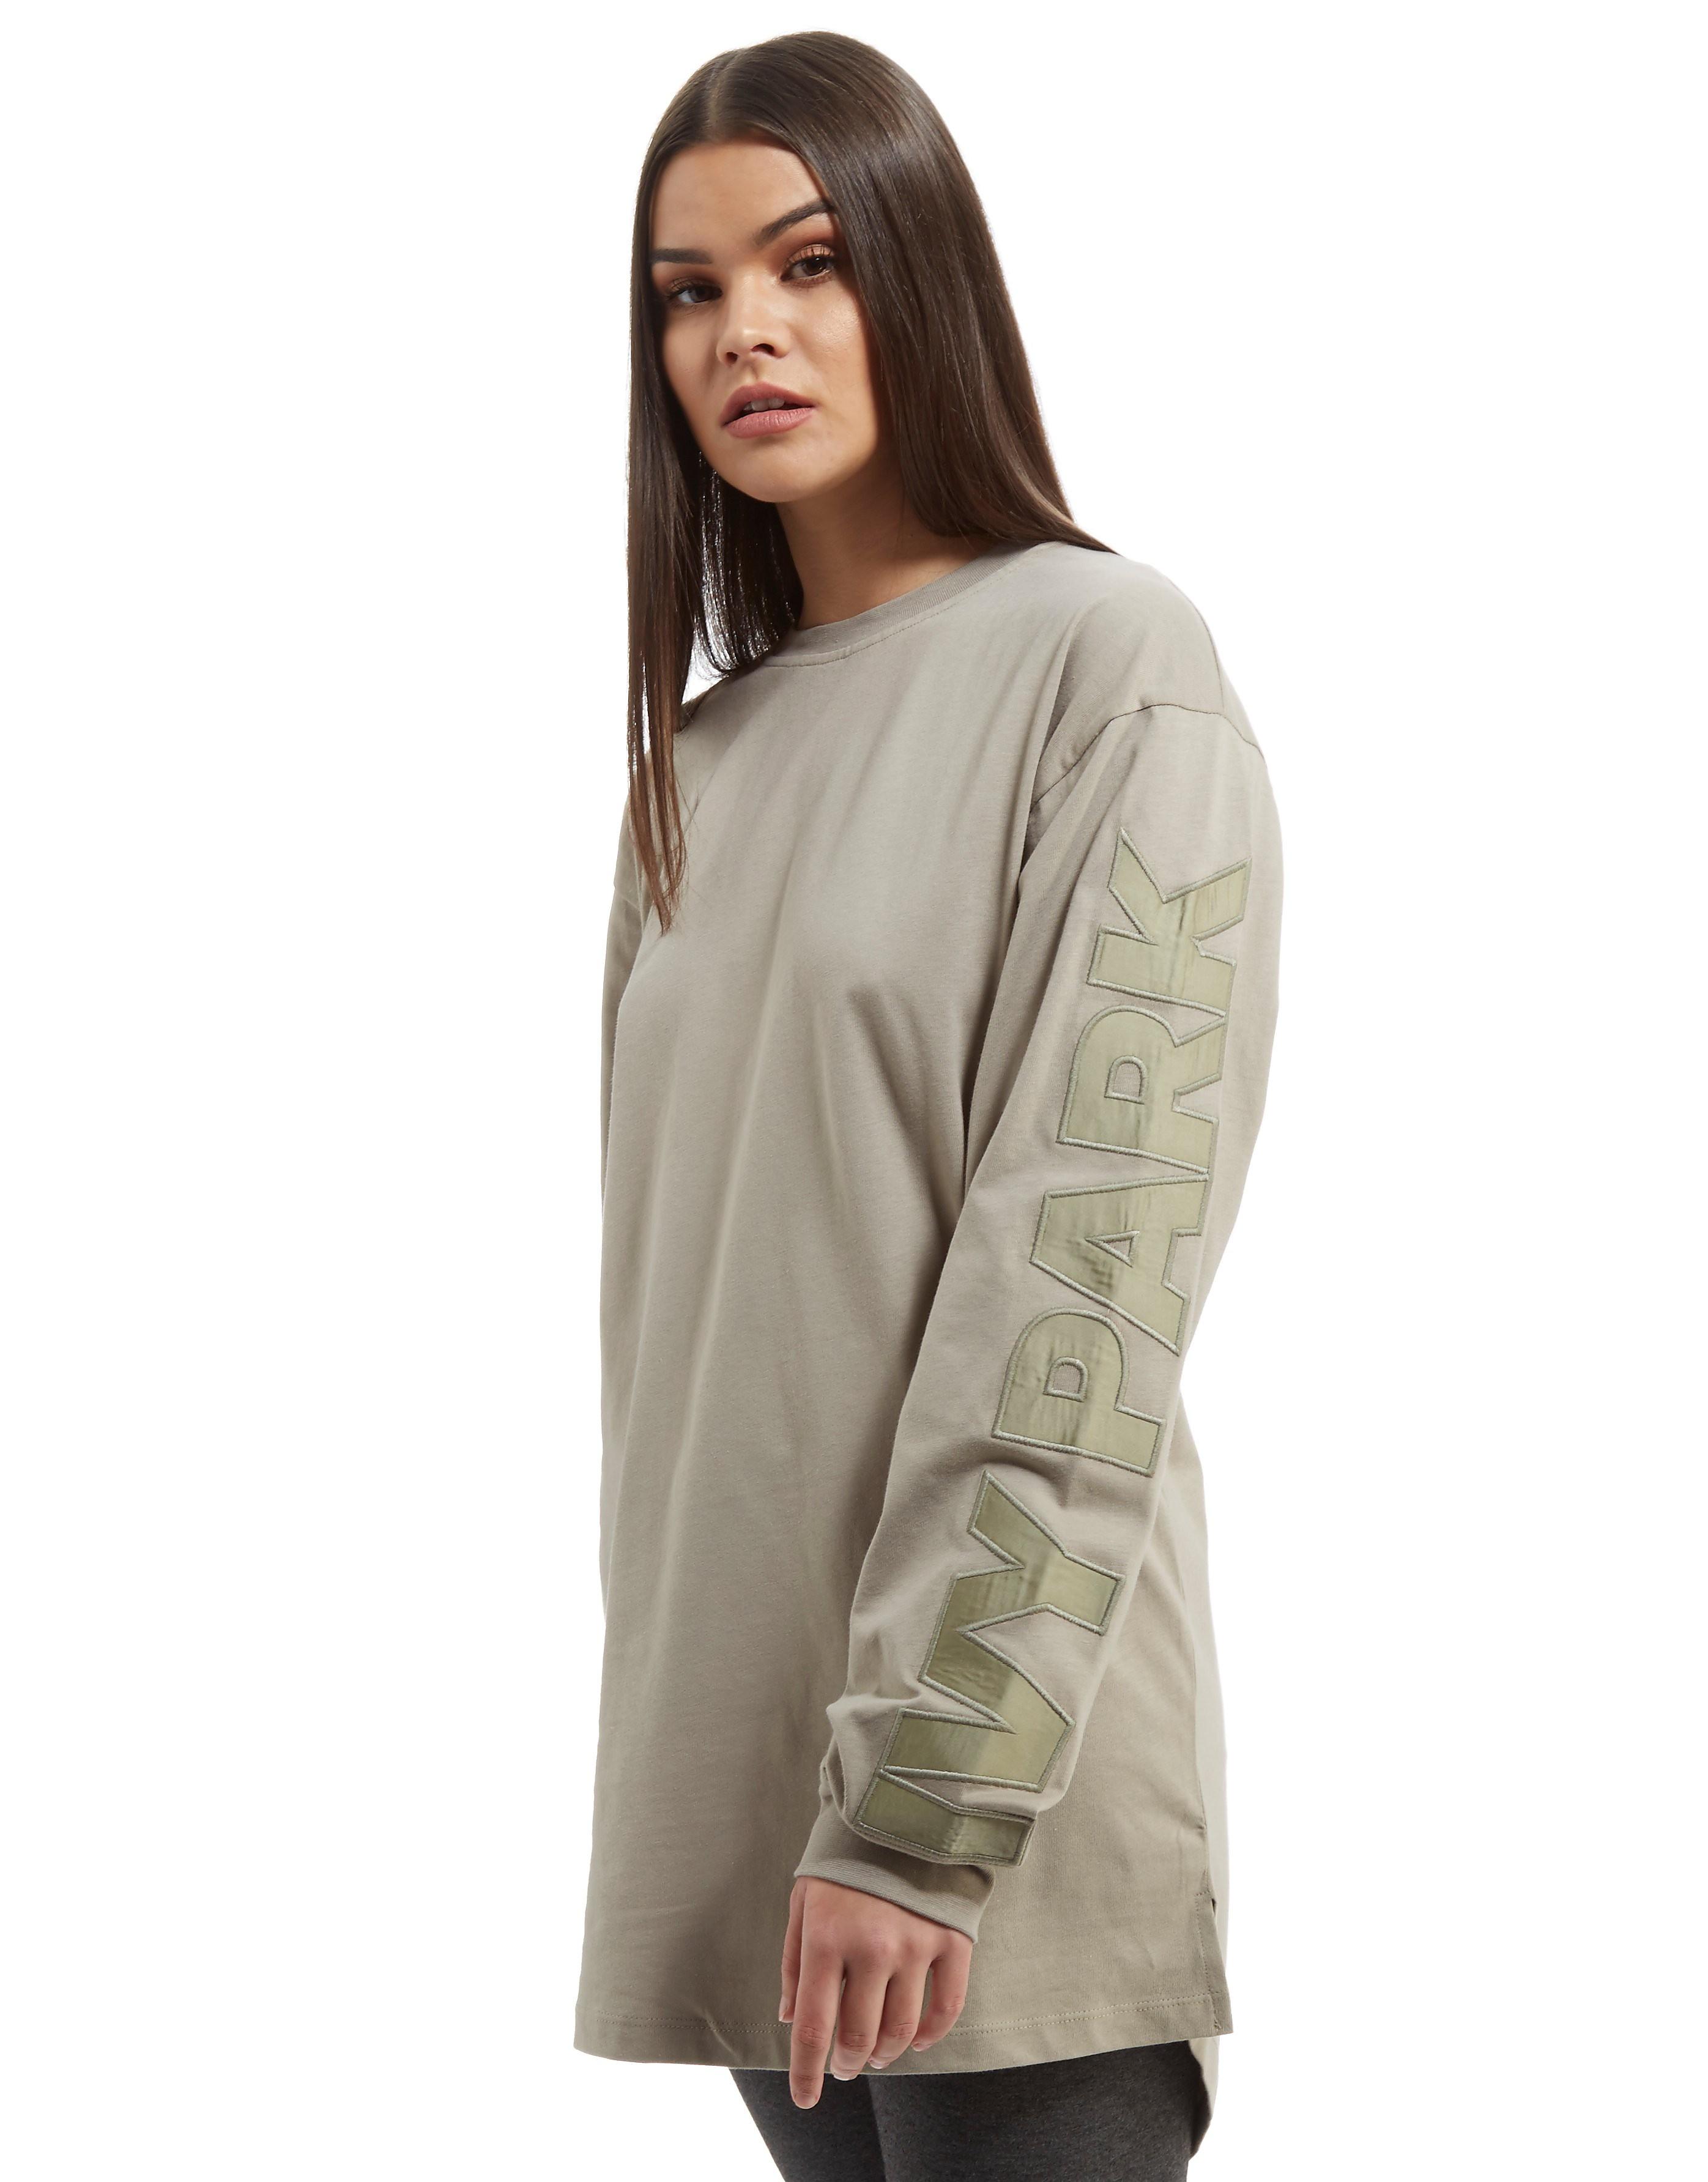 IVY PARK Boyfriend Long Sleeve Logo T-Shirt